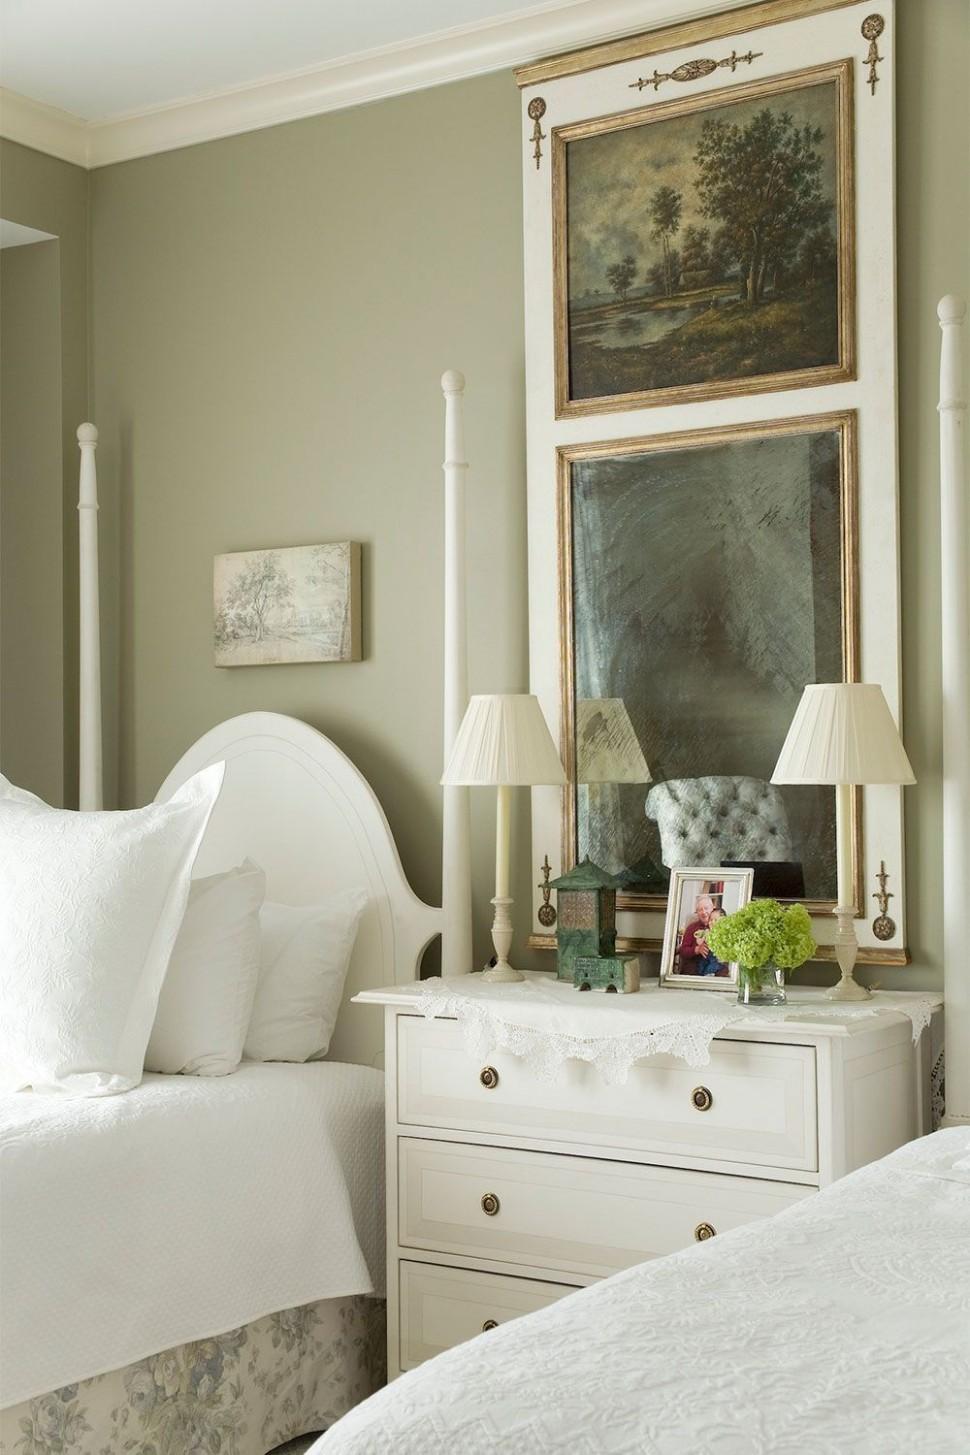 8 Green Bedroom Design Ideas for a Fresh Upgrade - Bedroom Ideas Green